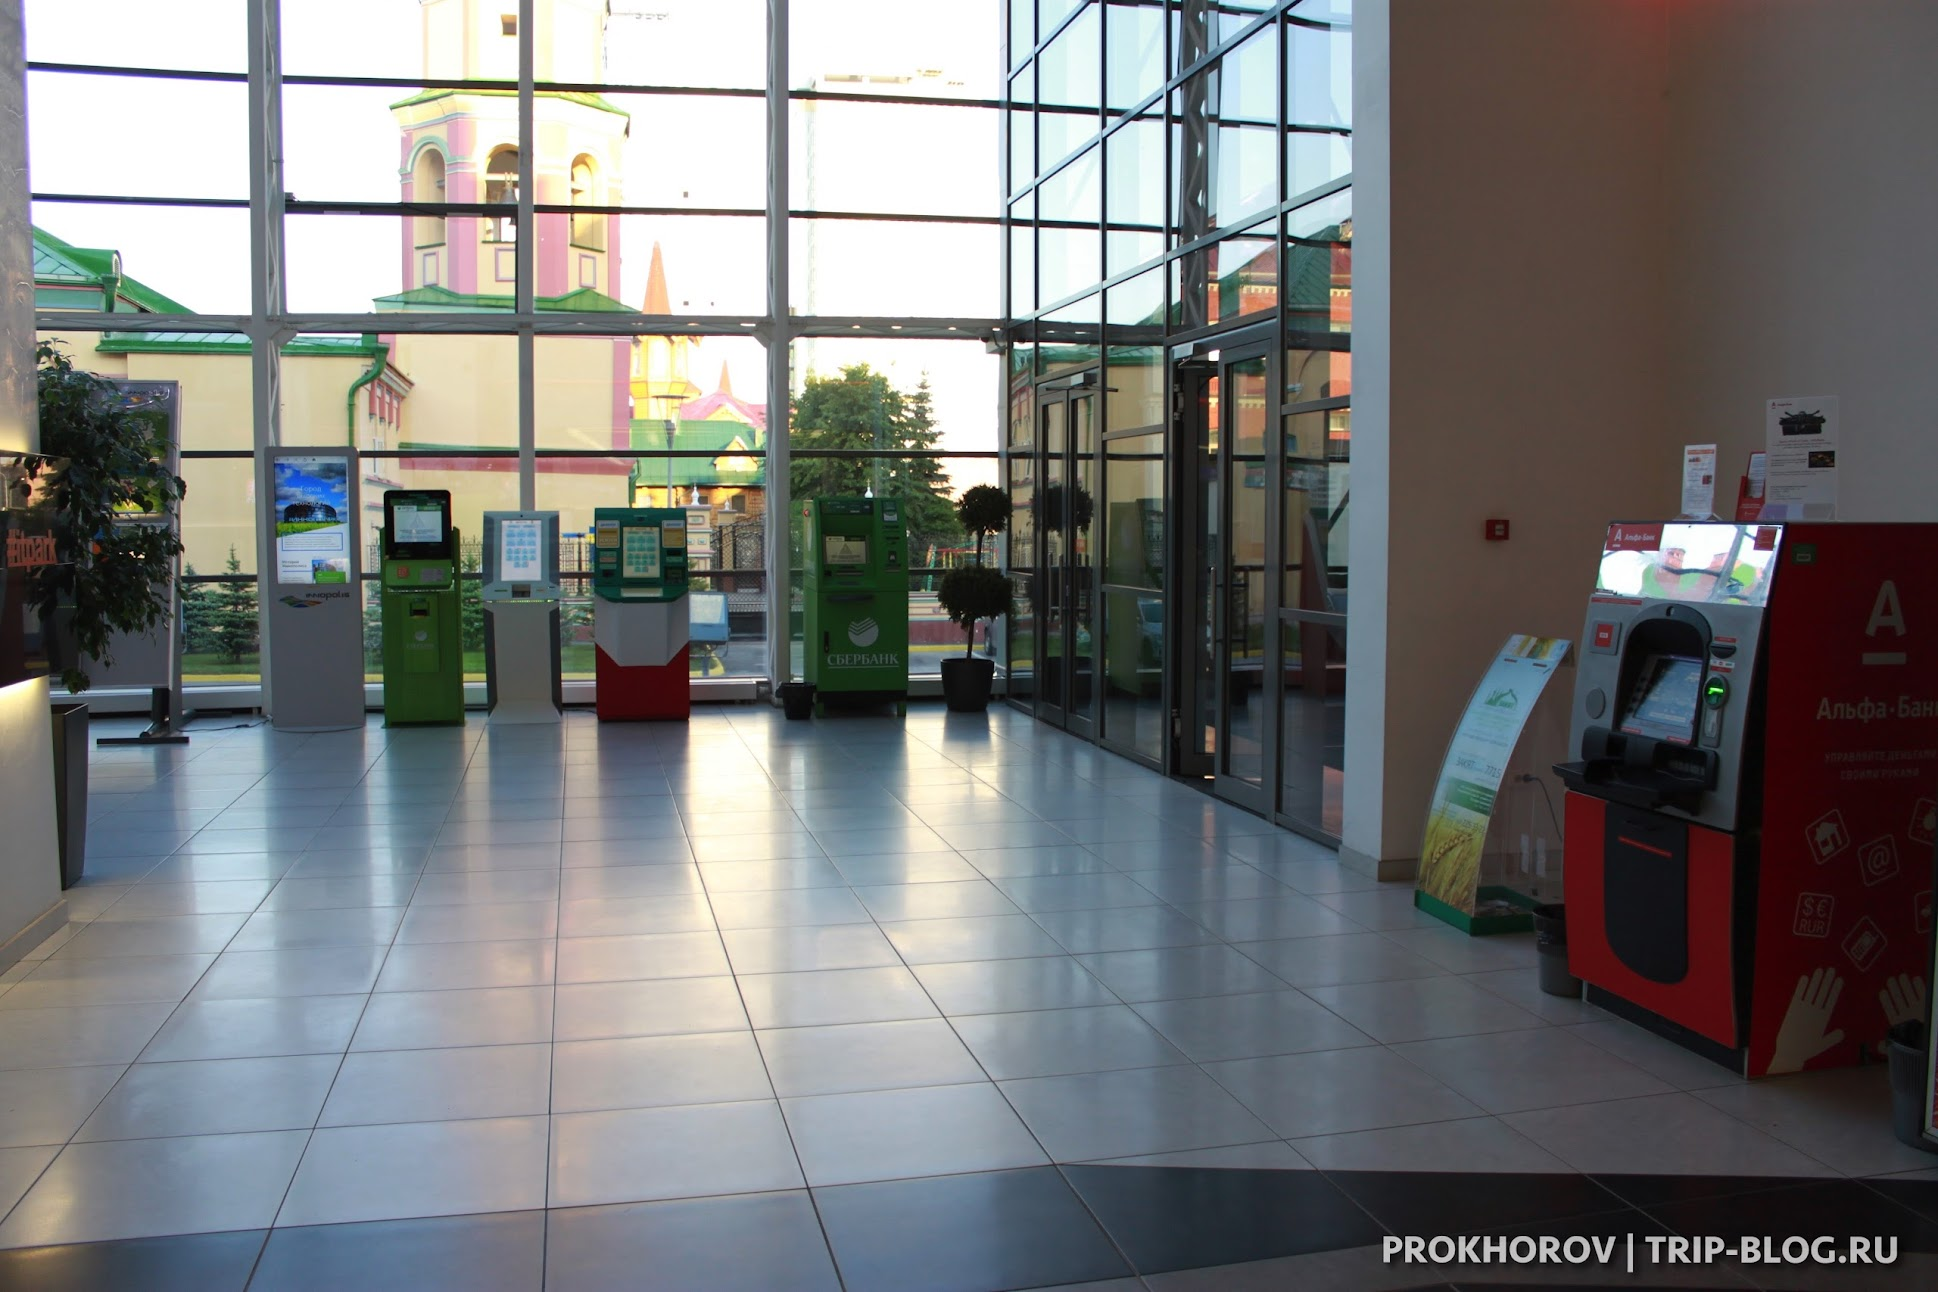 ИТ-парк Казань